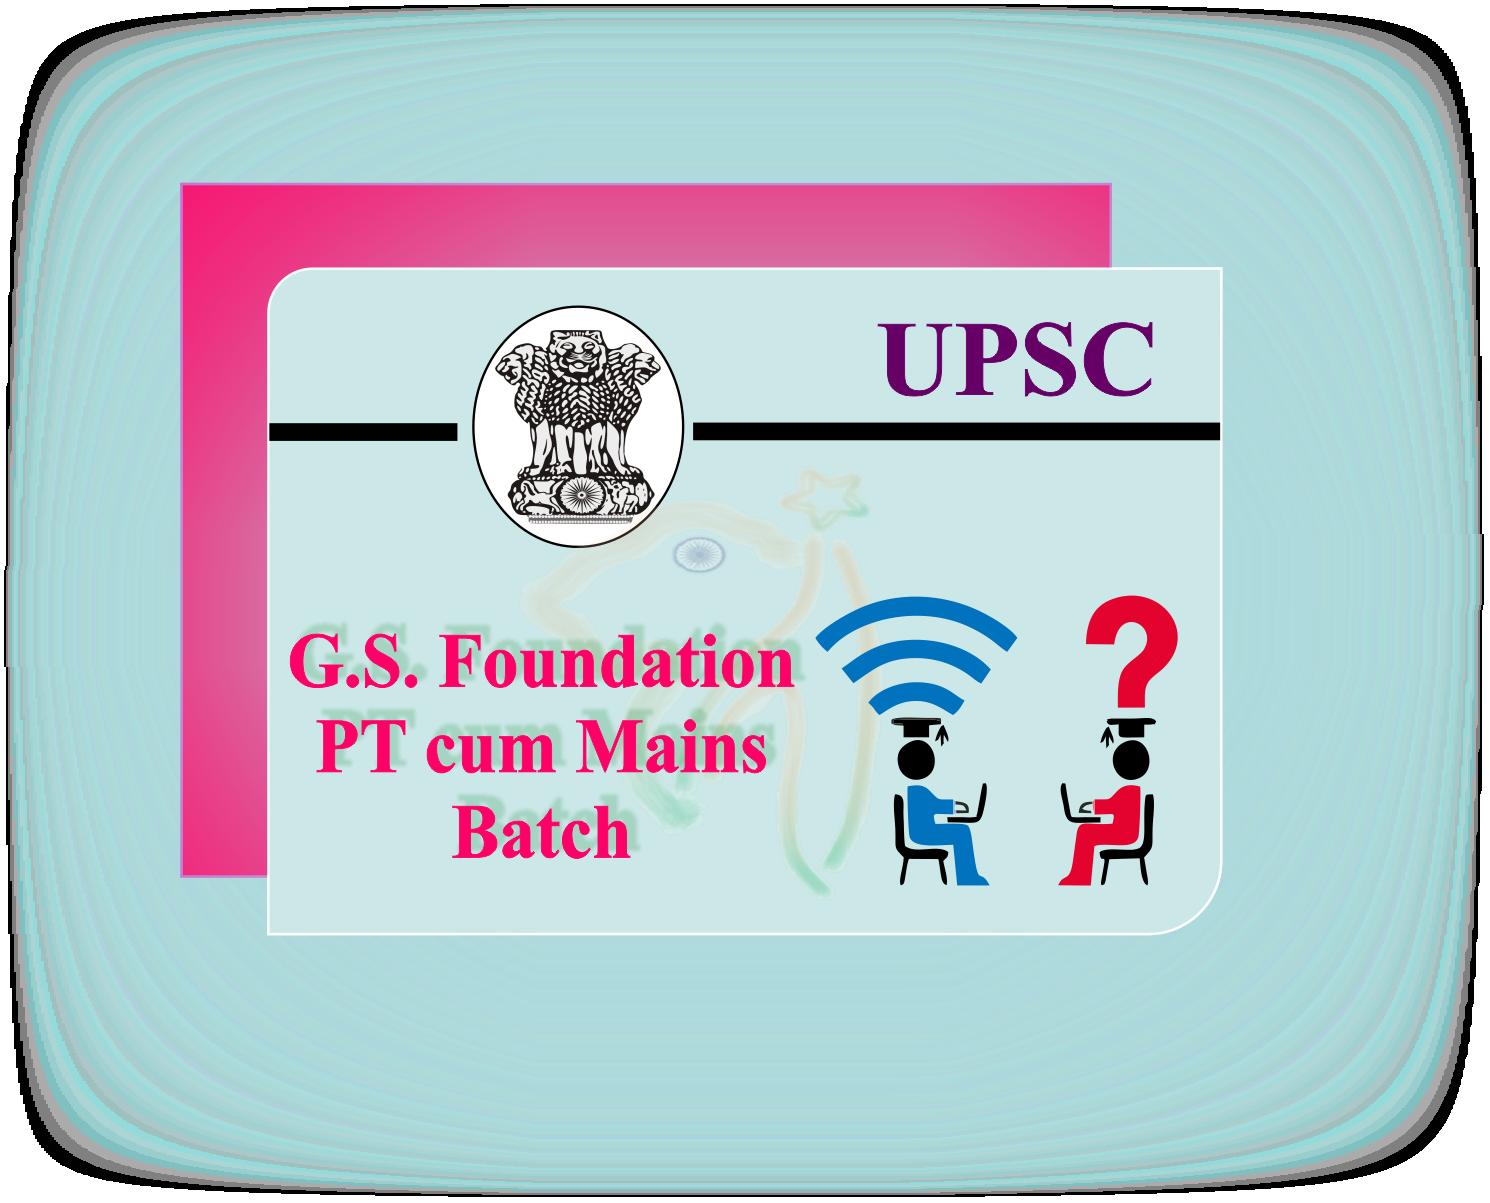 UPSC GS Foundation Batch